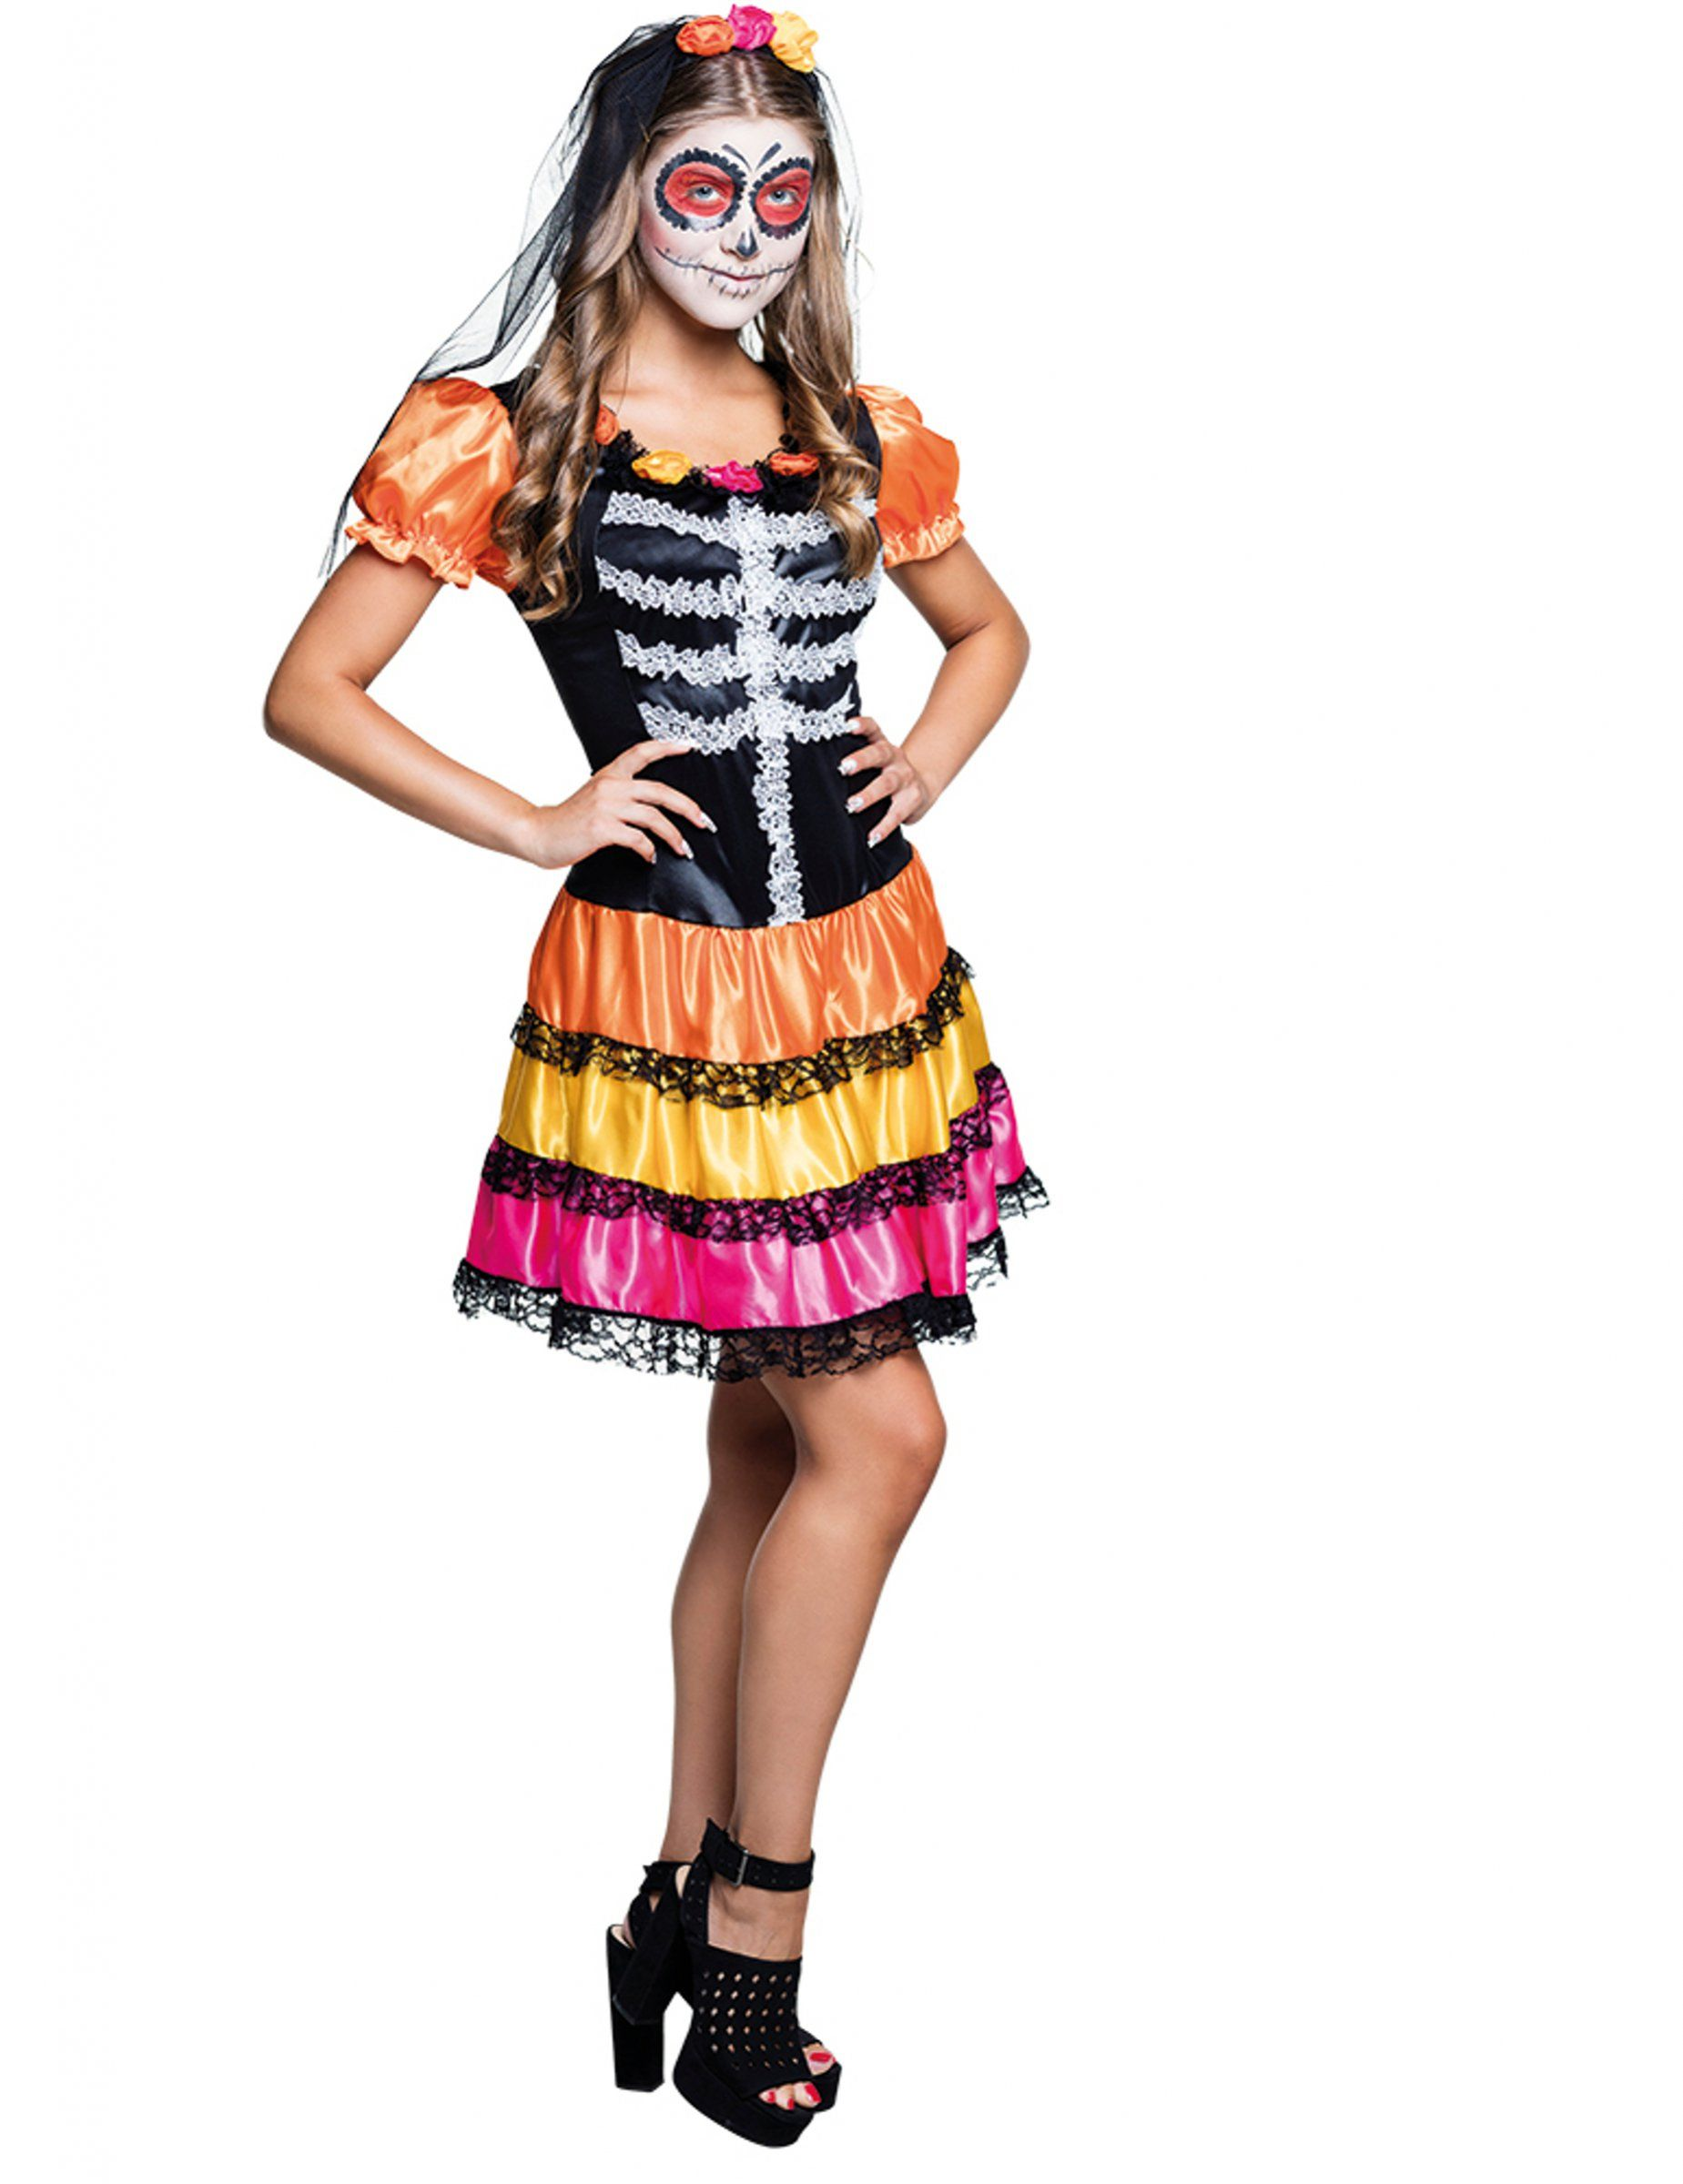 Short femme LE JOUR DES MORTS Senorita Squelette Costume Halloween Robe Fantaisie